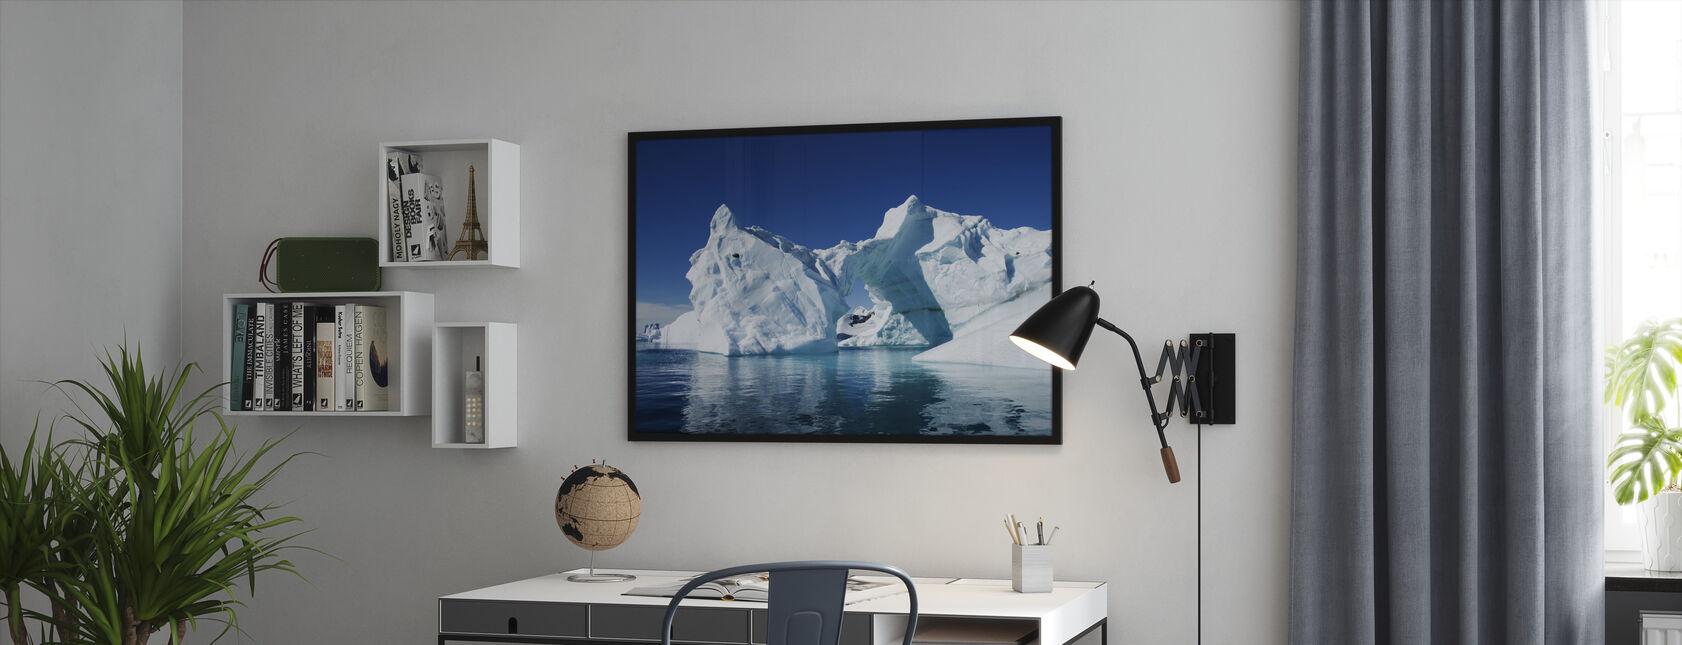 Iceberg Antarctica - Framed print - Office